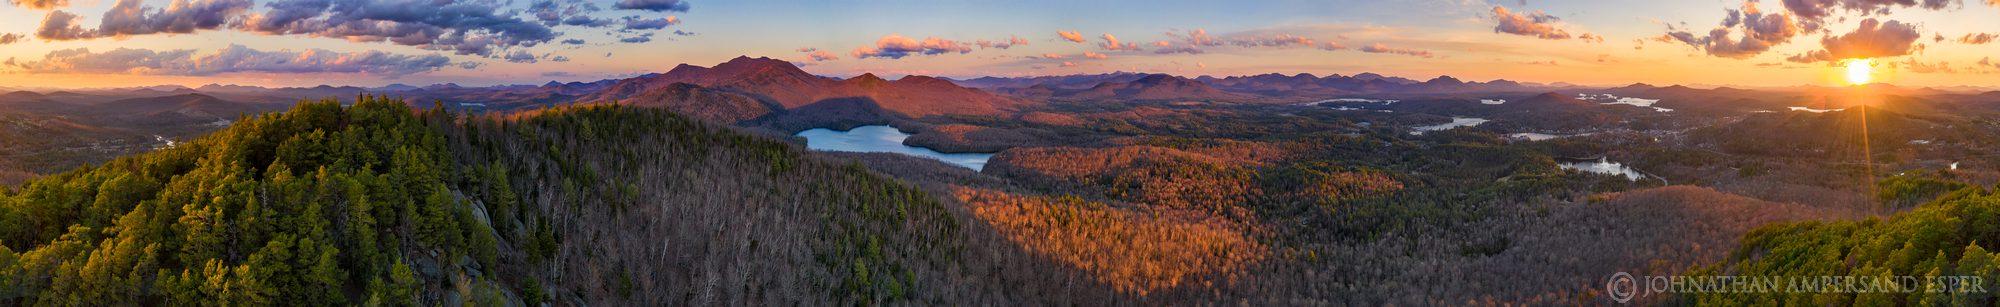 Baker Mt,drone,360 degree panorama,panorama,360,aerial,May,spring,2020,sunset,Saranac Lake,Saranac Lake village,town of Saranac Lake,McKenzie Mt,McKenzie Pond,High Peaks,, photo